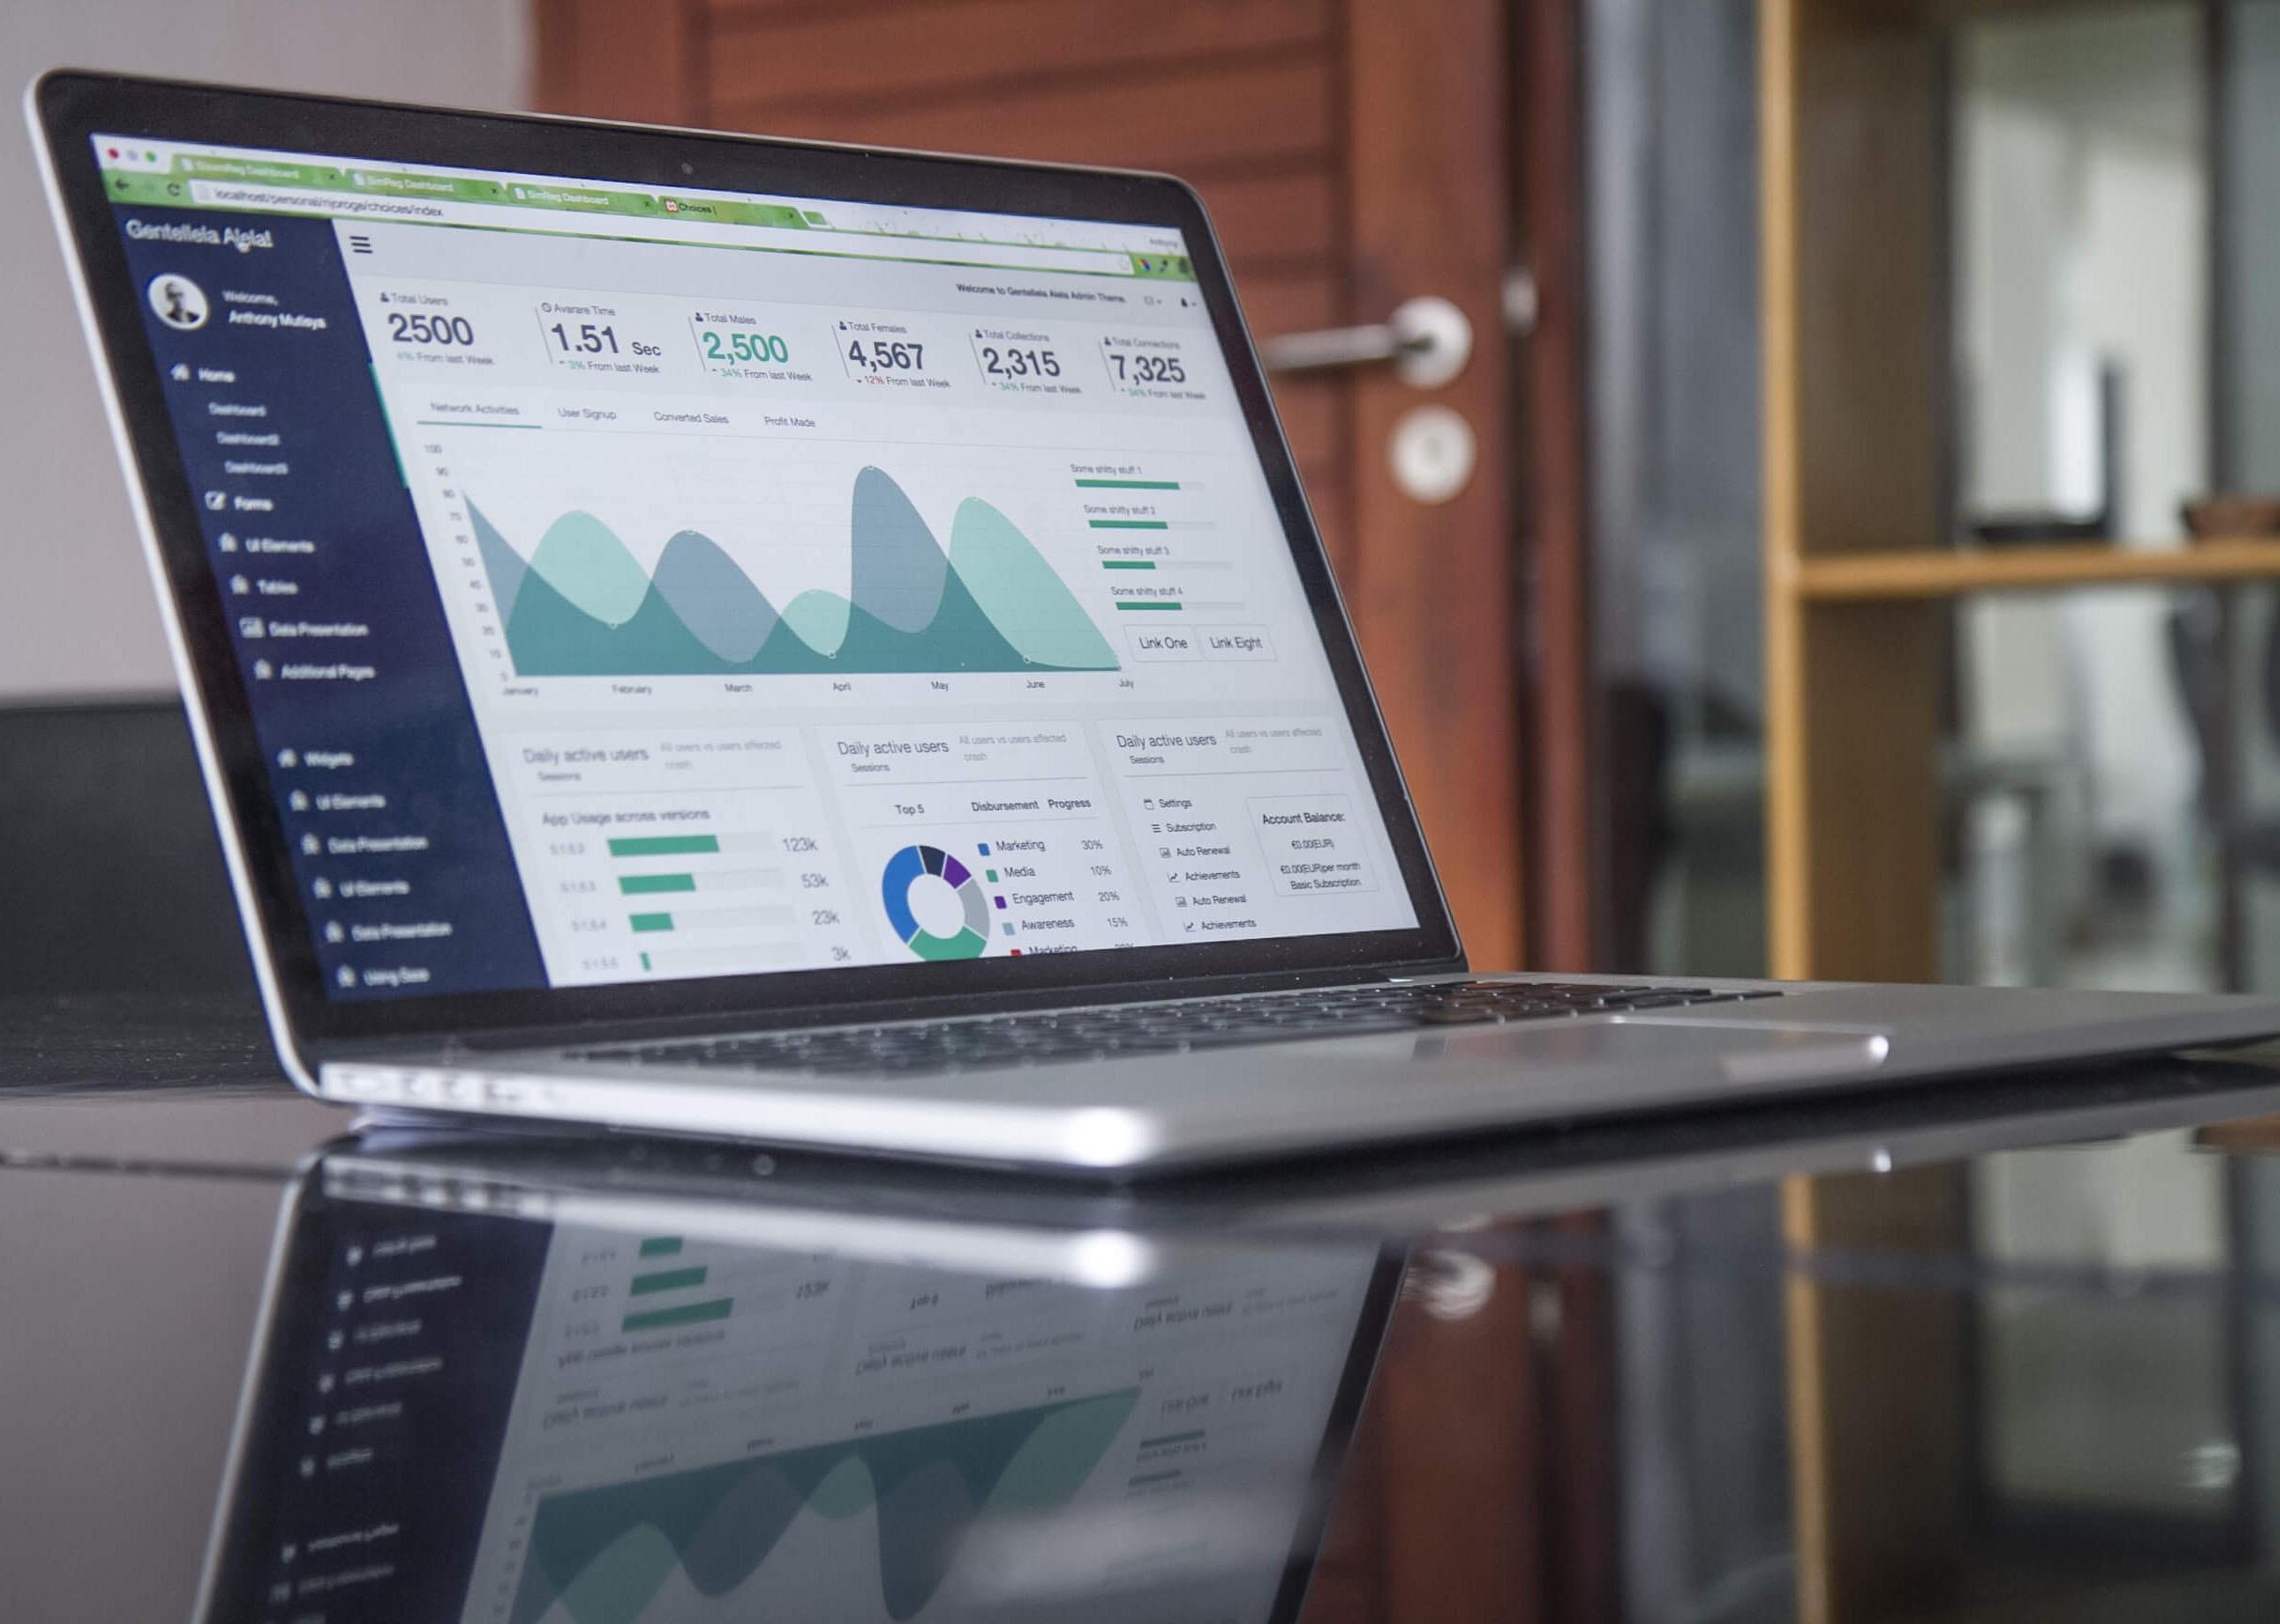 7 Essential Steps to Analyze Your Data